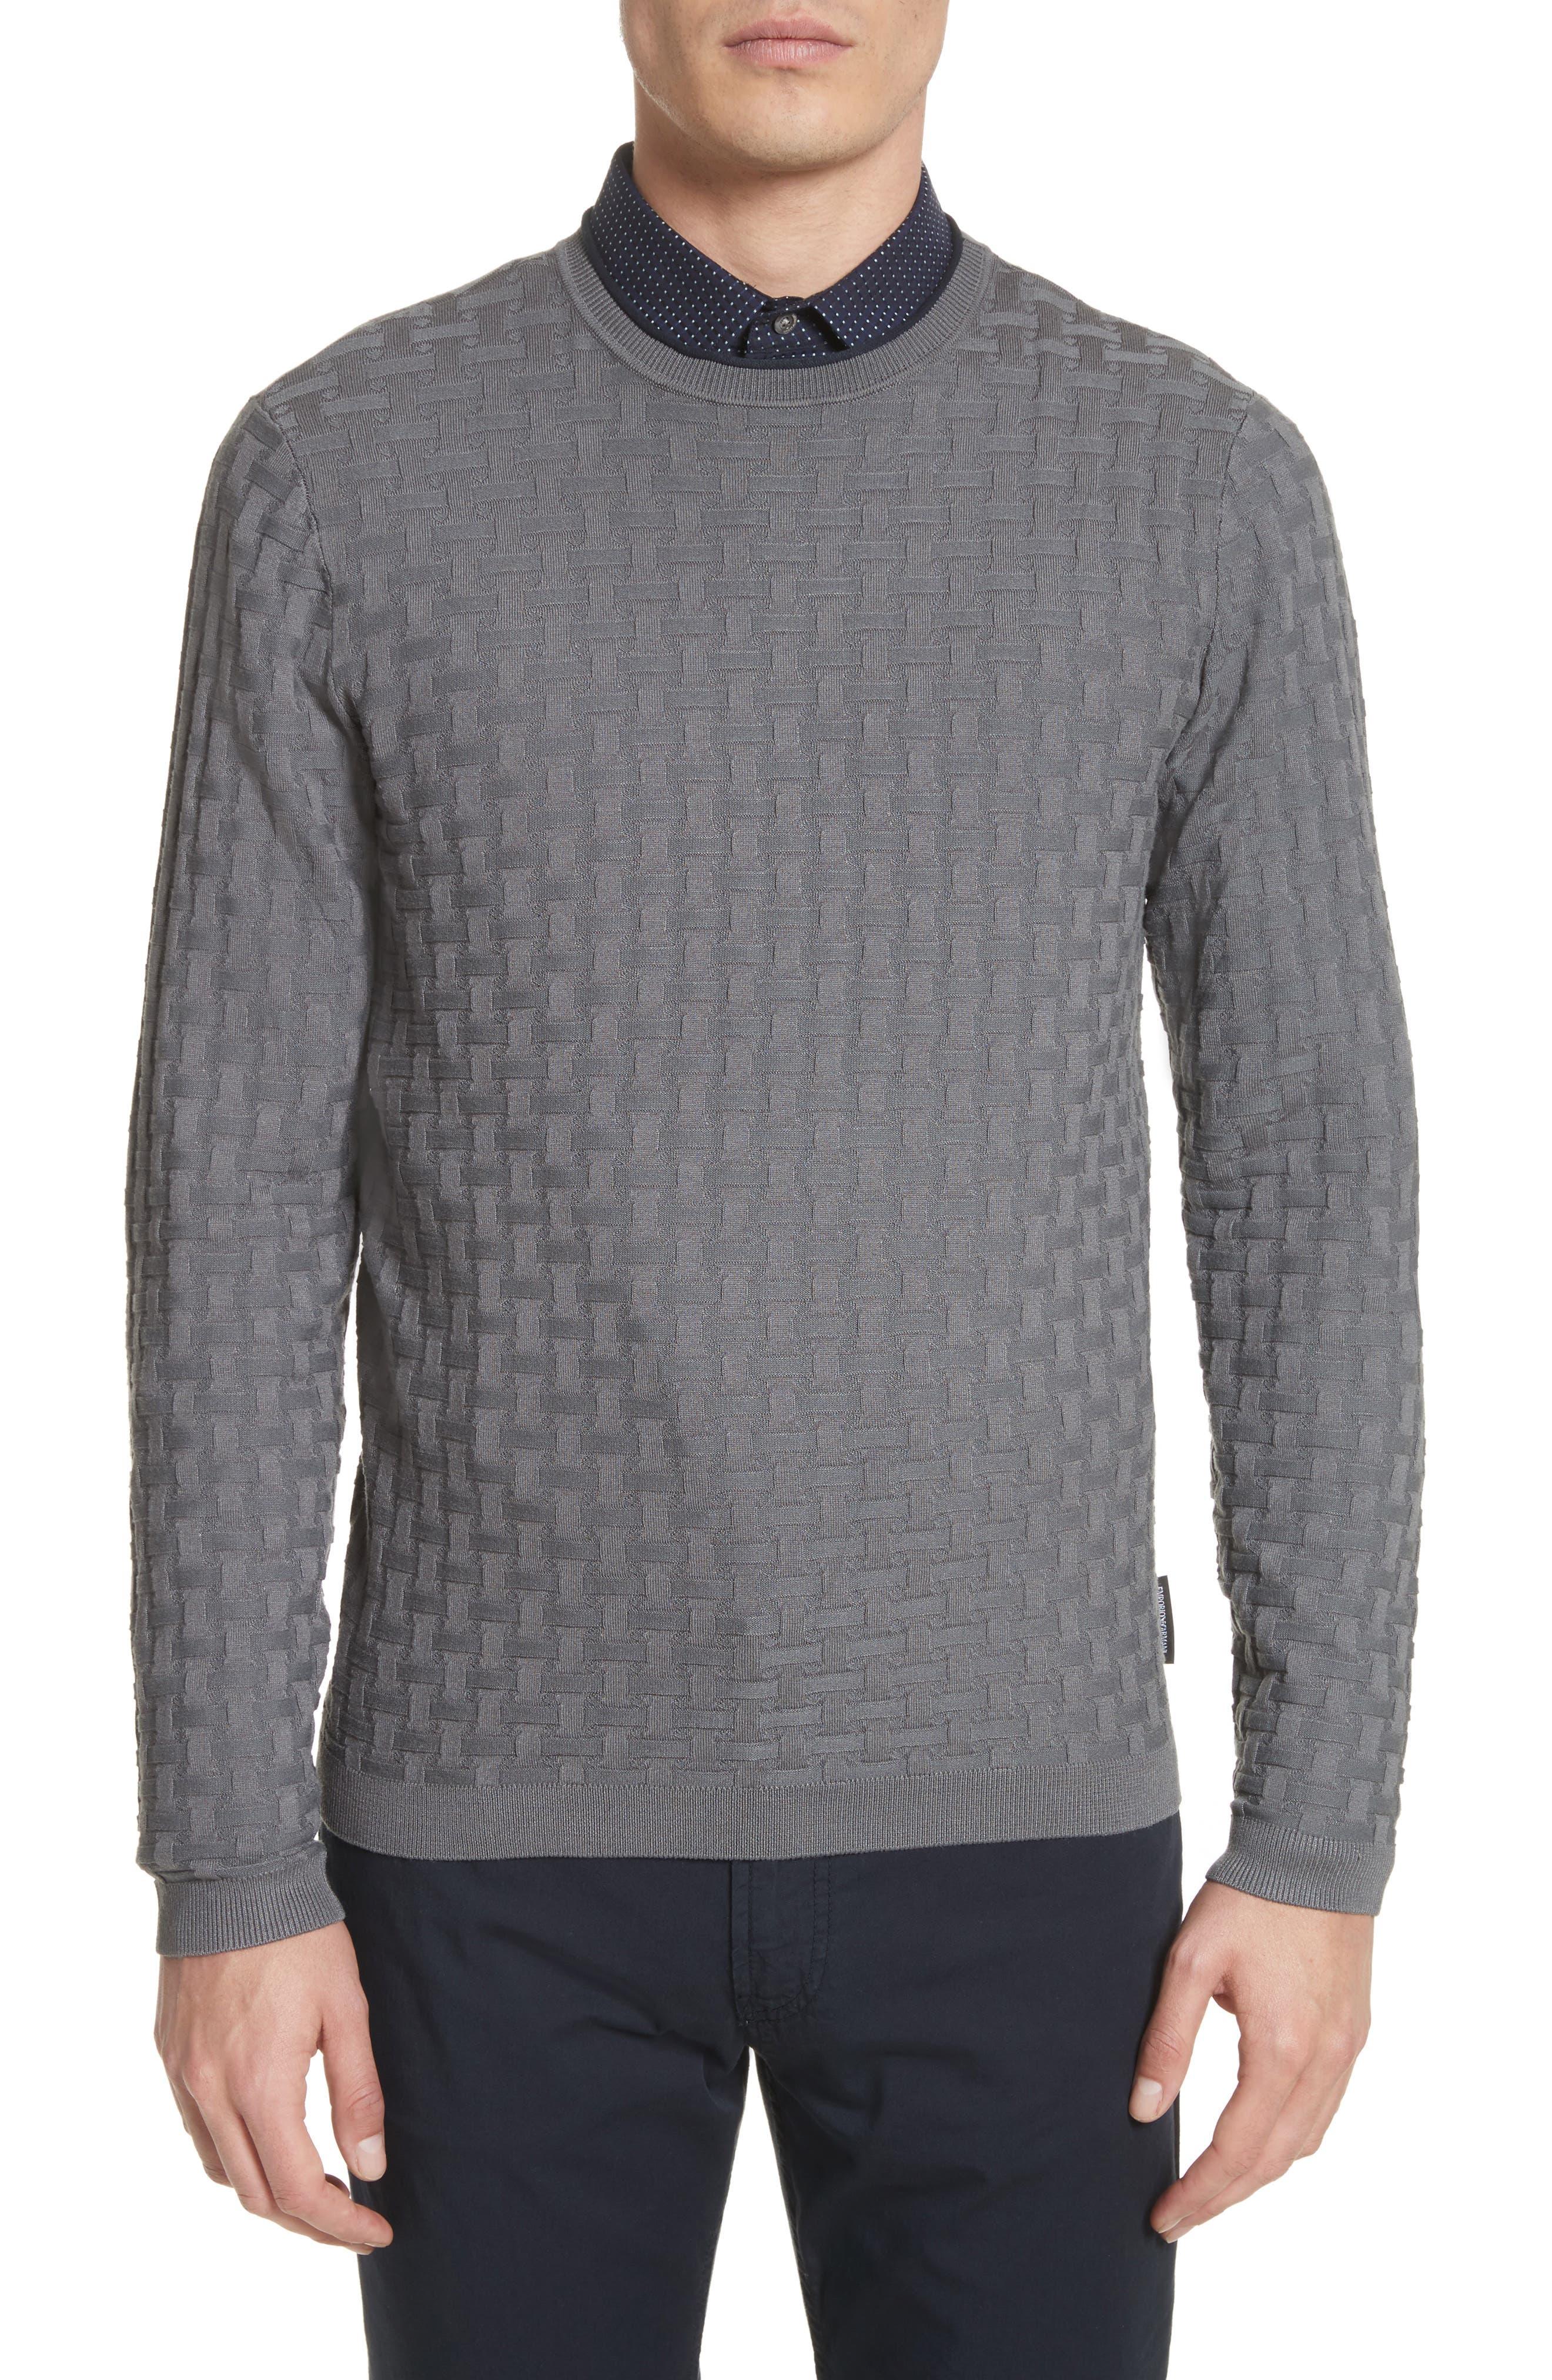 Main Image - Emporio Armani Slim Fit Woven Links Sweater